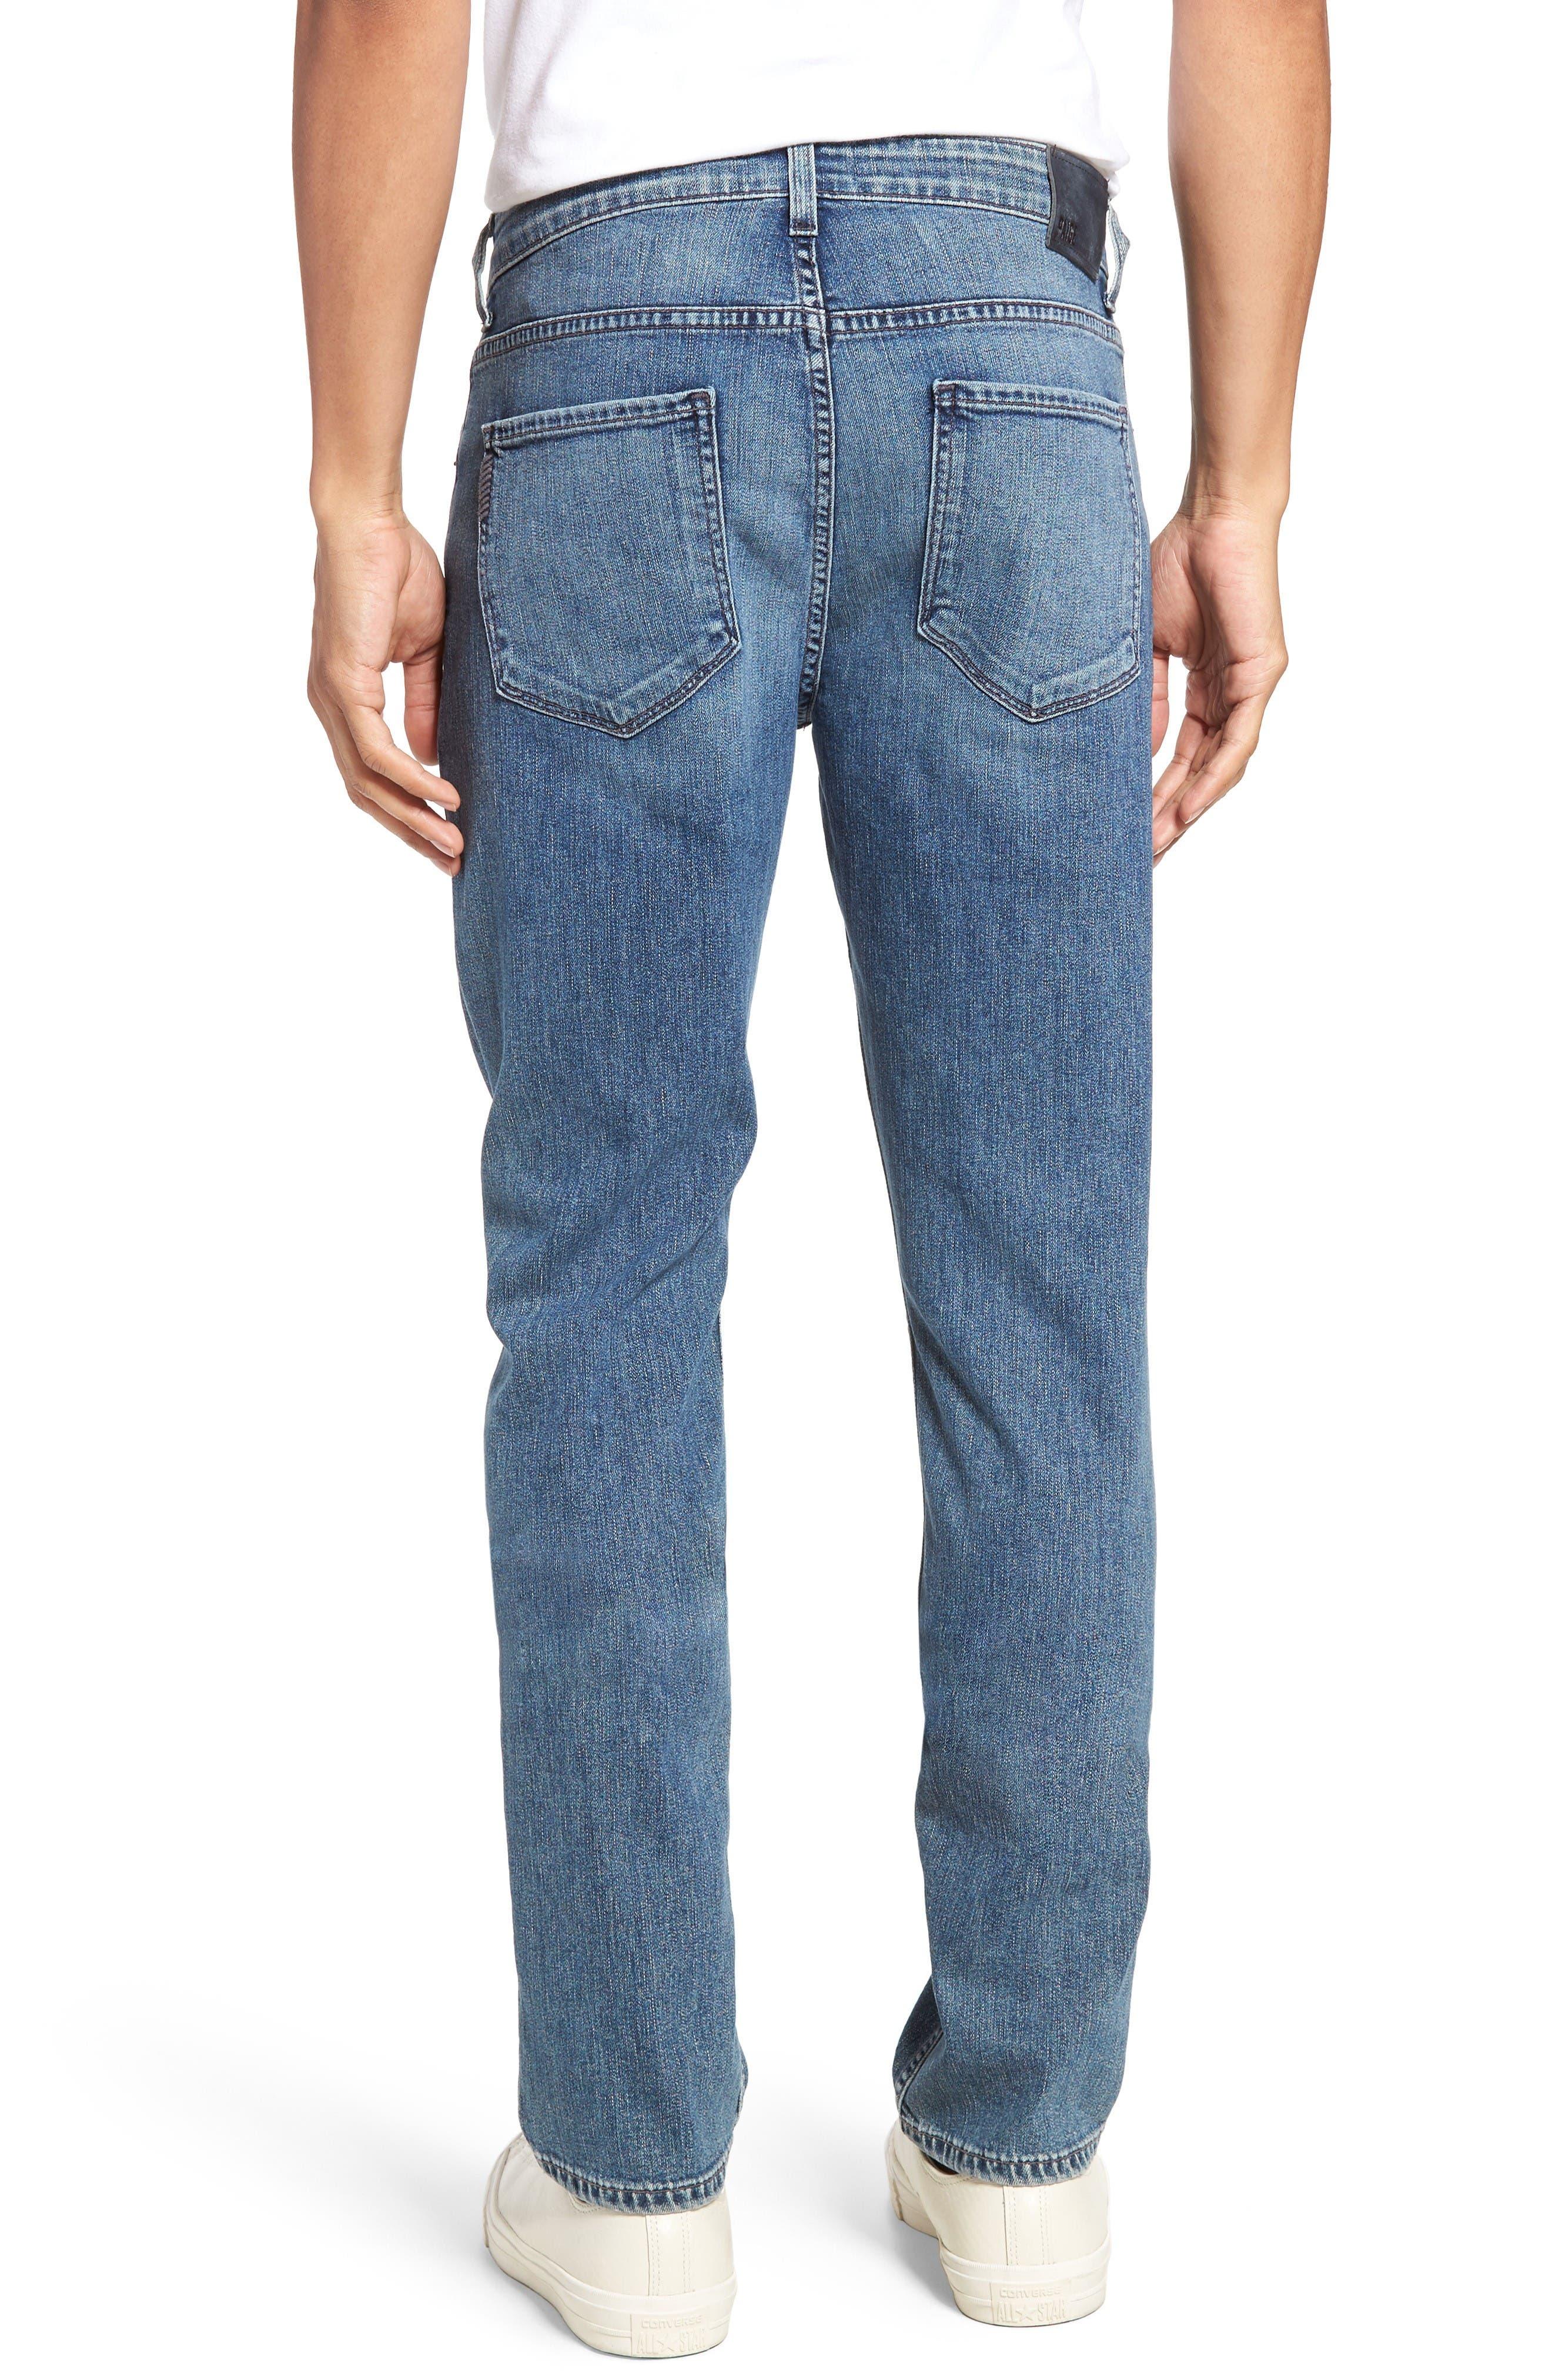 Normandie Straight Leg Jeans,                             Alternate thumbnail 2, color,                             Gibbs